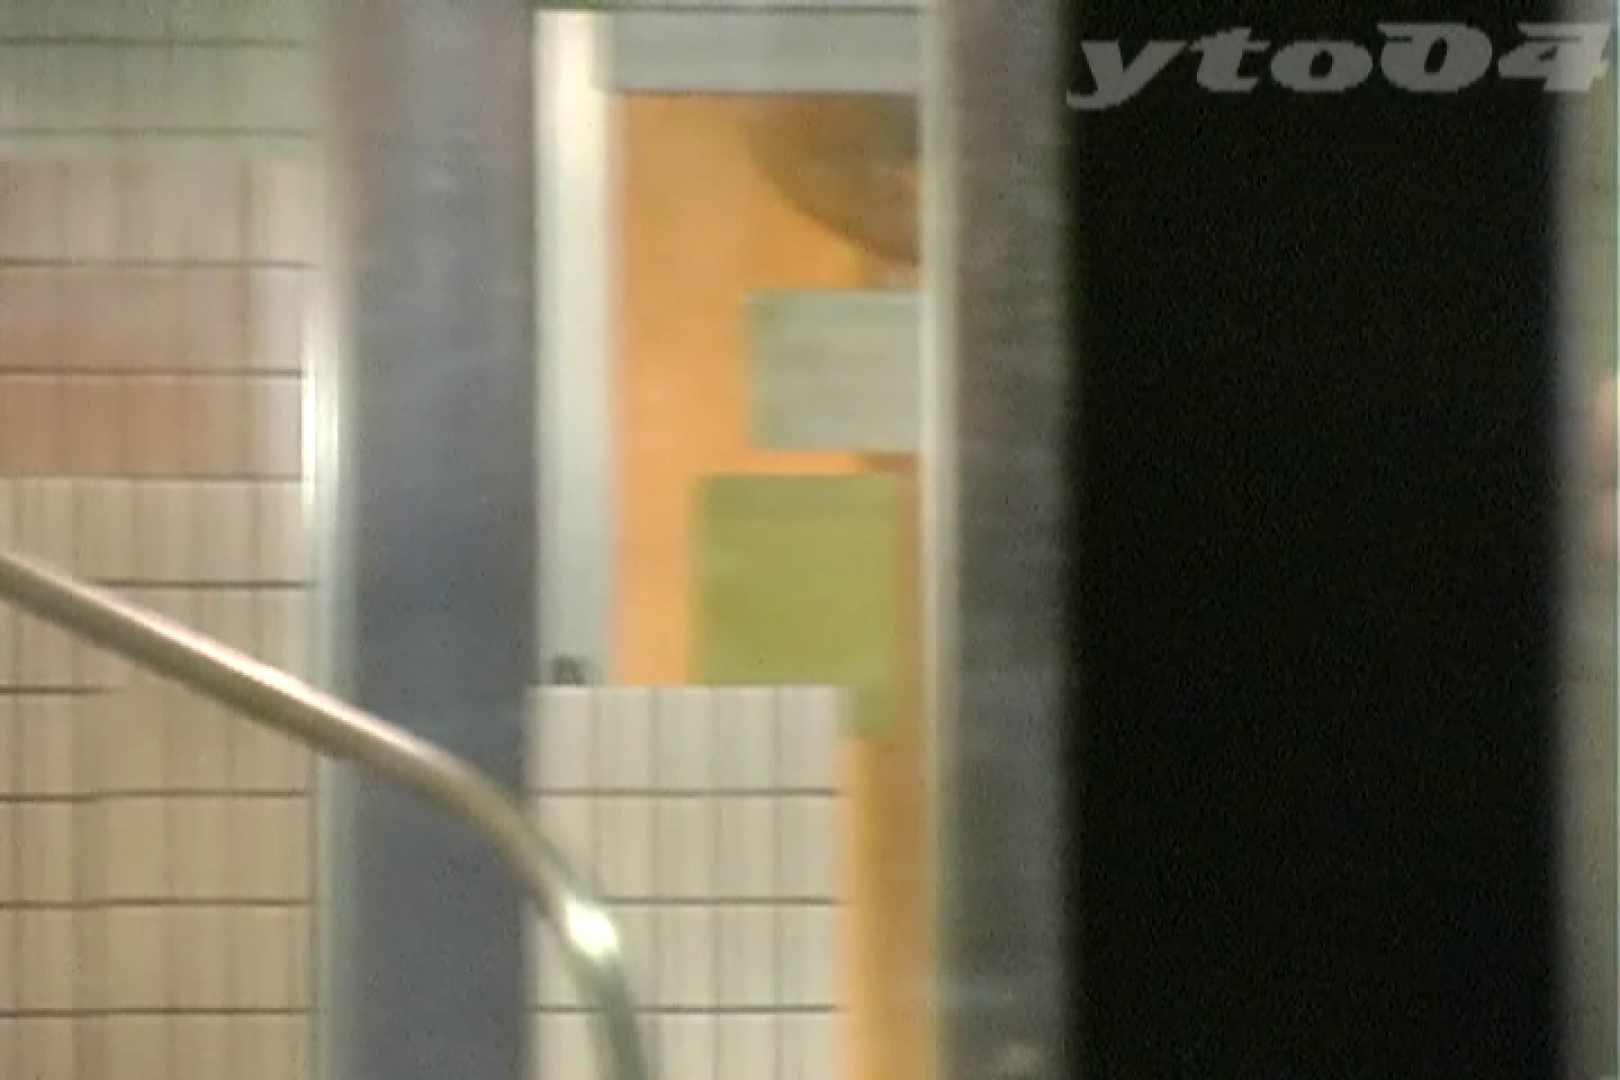 ▲復活限定▲合宿ホテル女風呂盗撮 Vol.24 名作  55pic 39